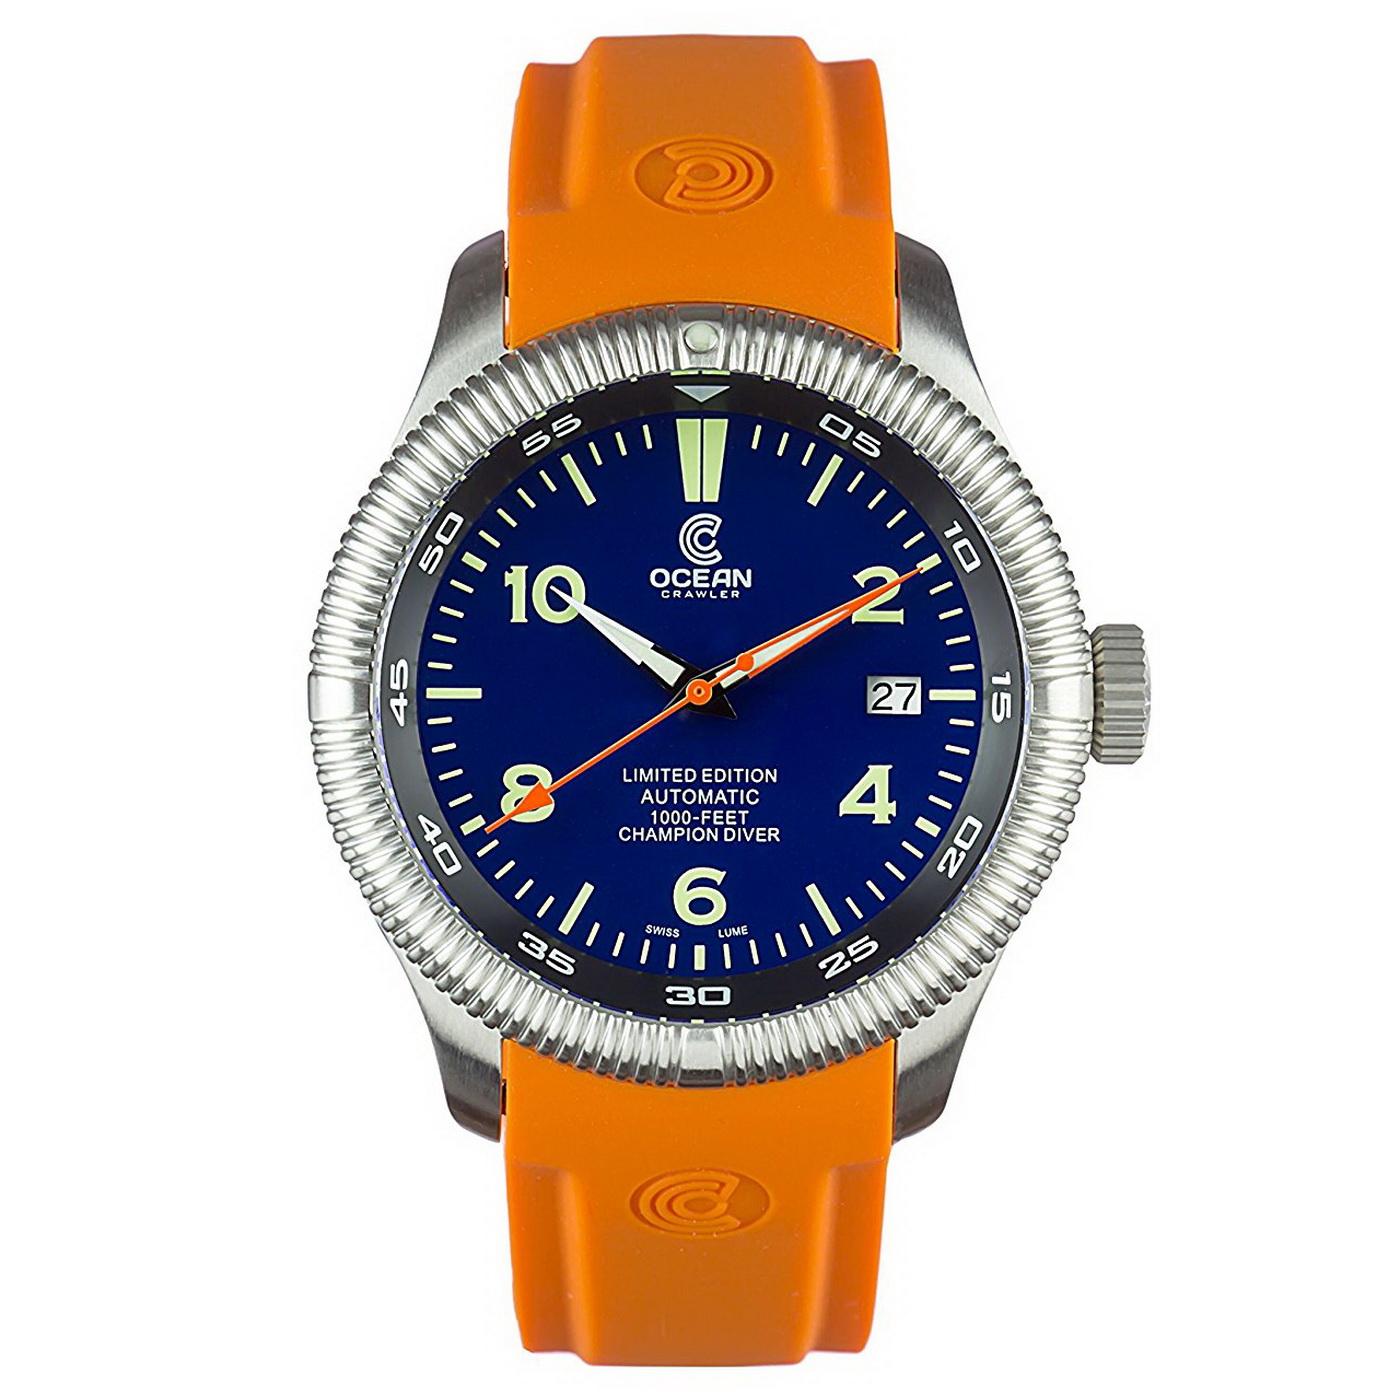 Oceanictime ocean crawler champion diver borealis - Oceanic dive watch ...